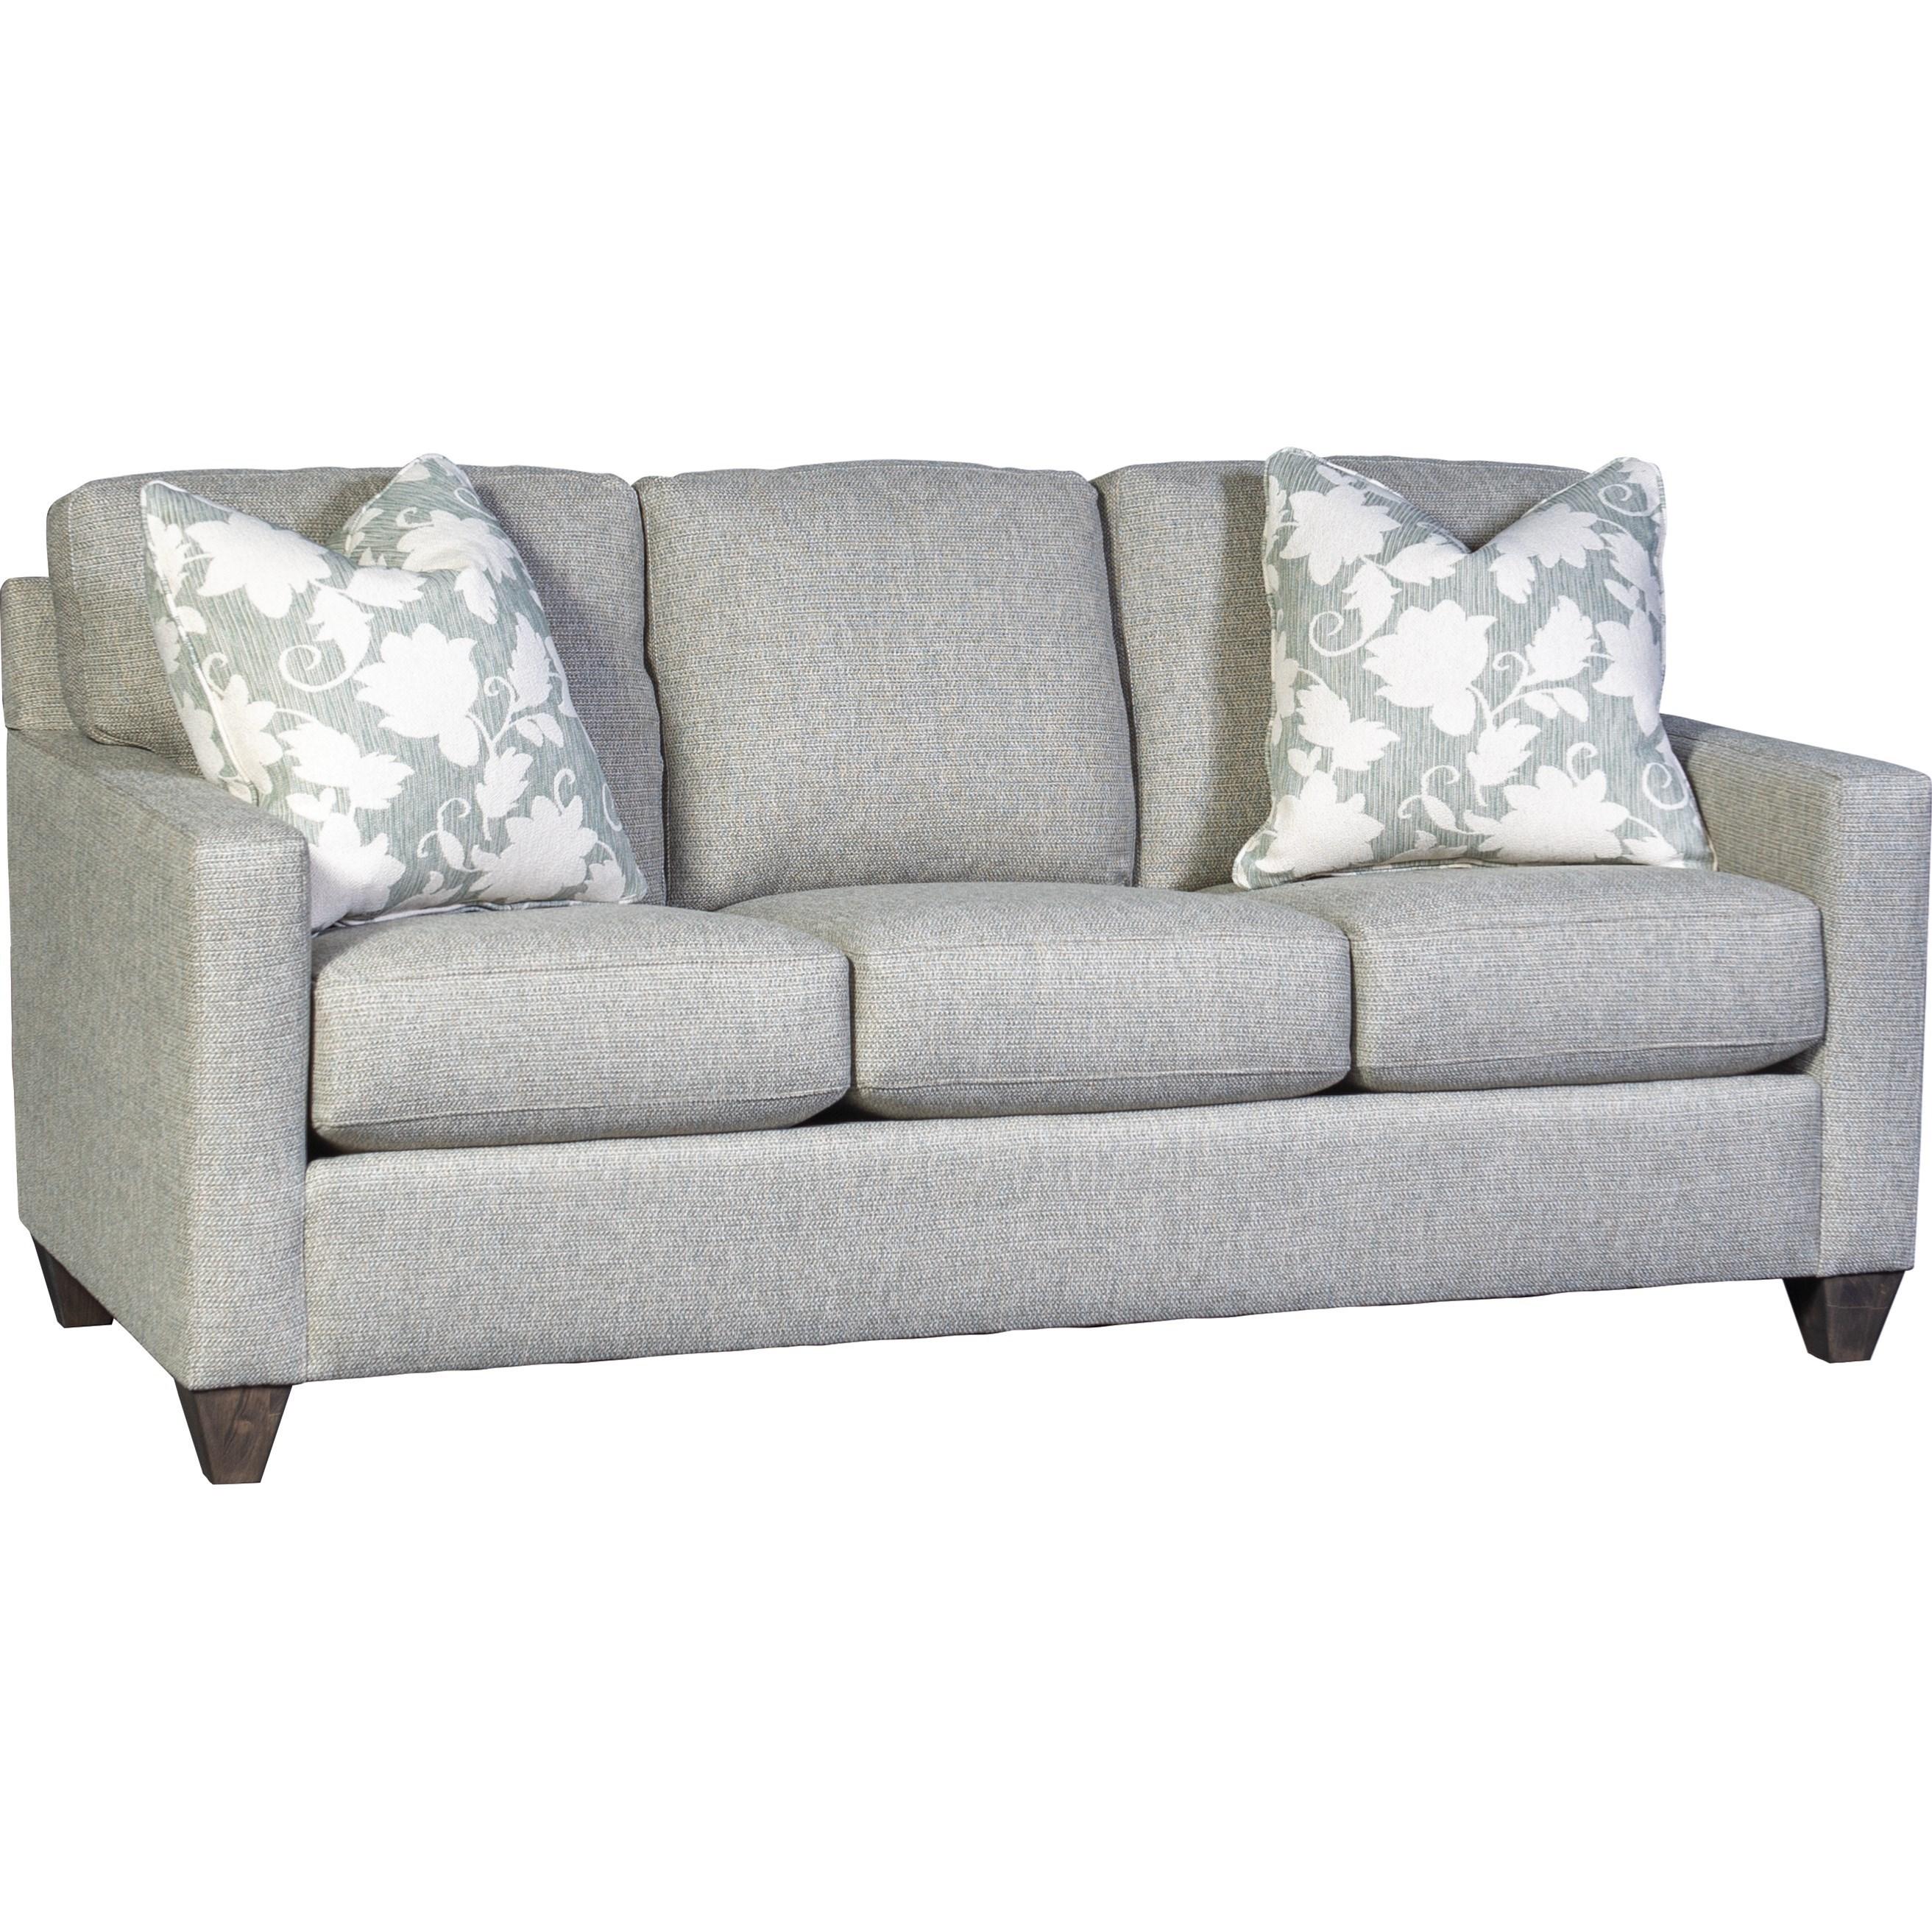 3488 Sofa by Mayo at Story & Lee Furniture